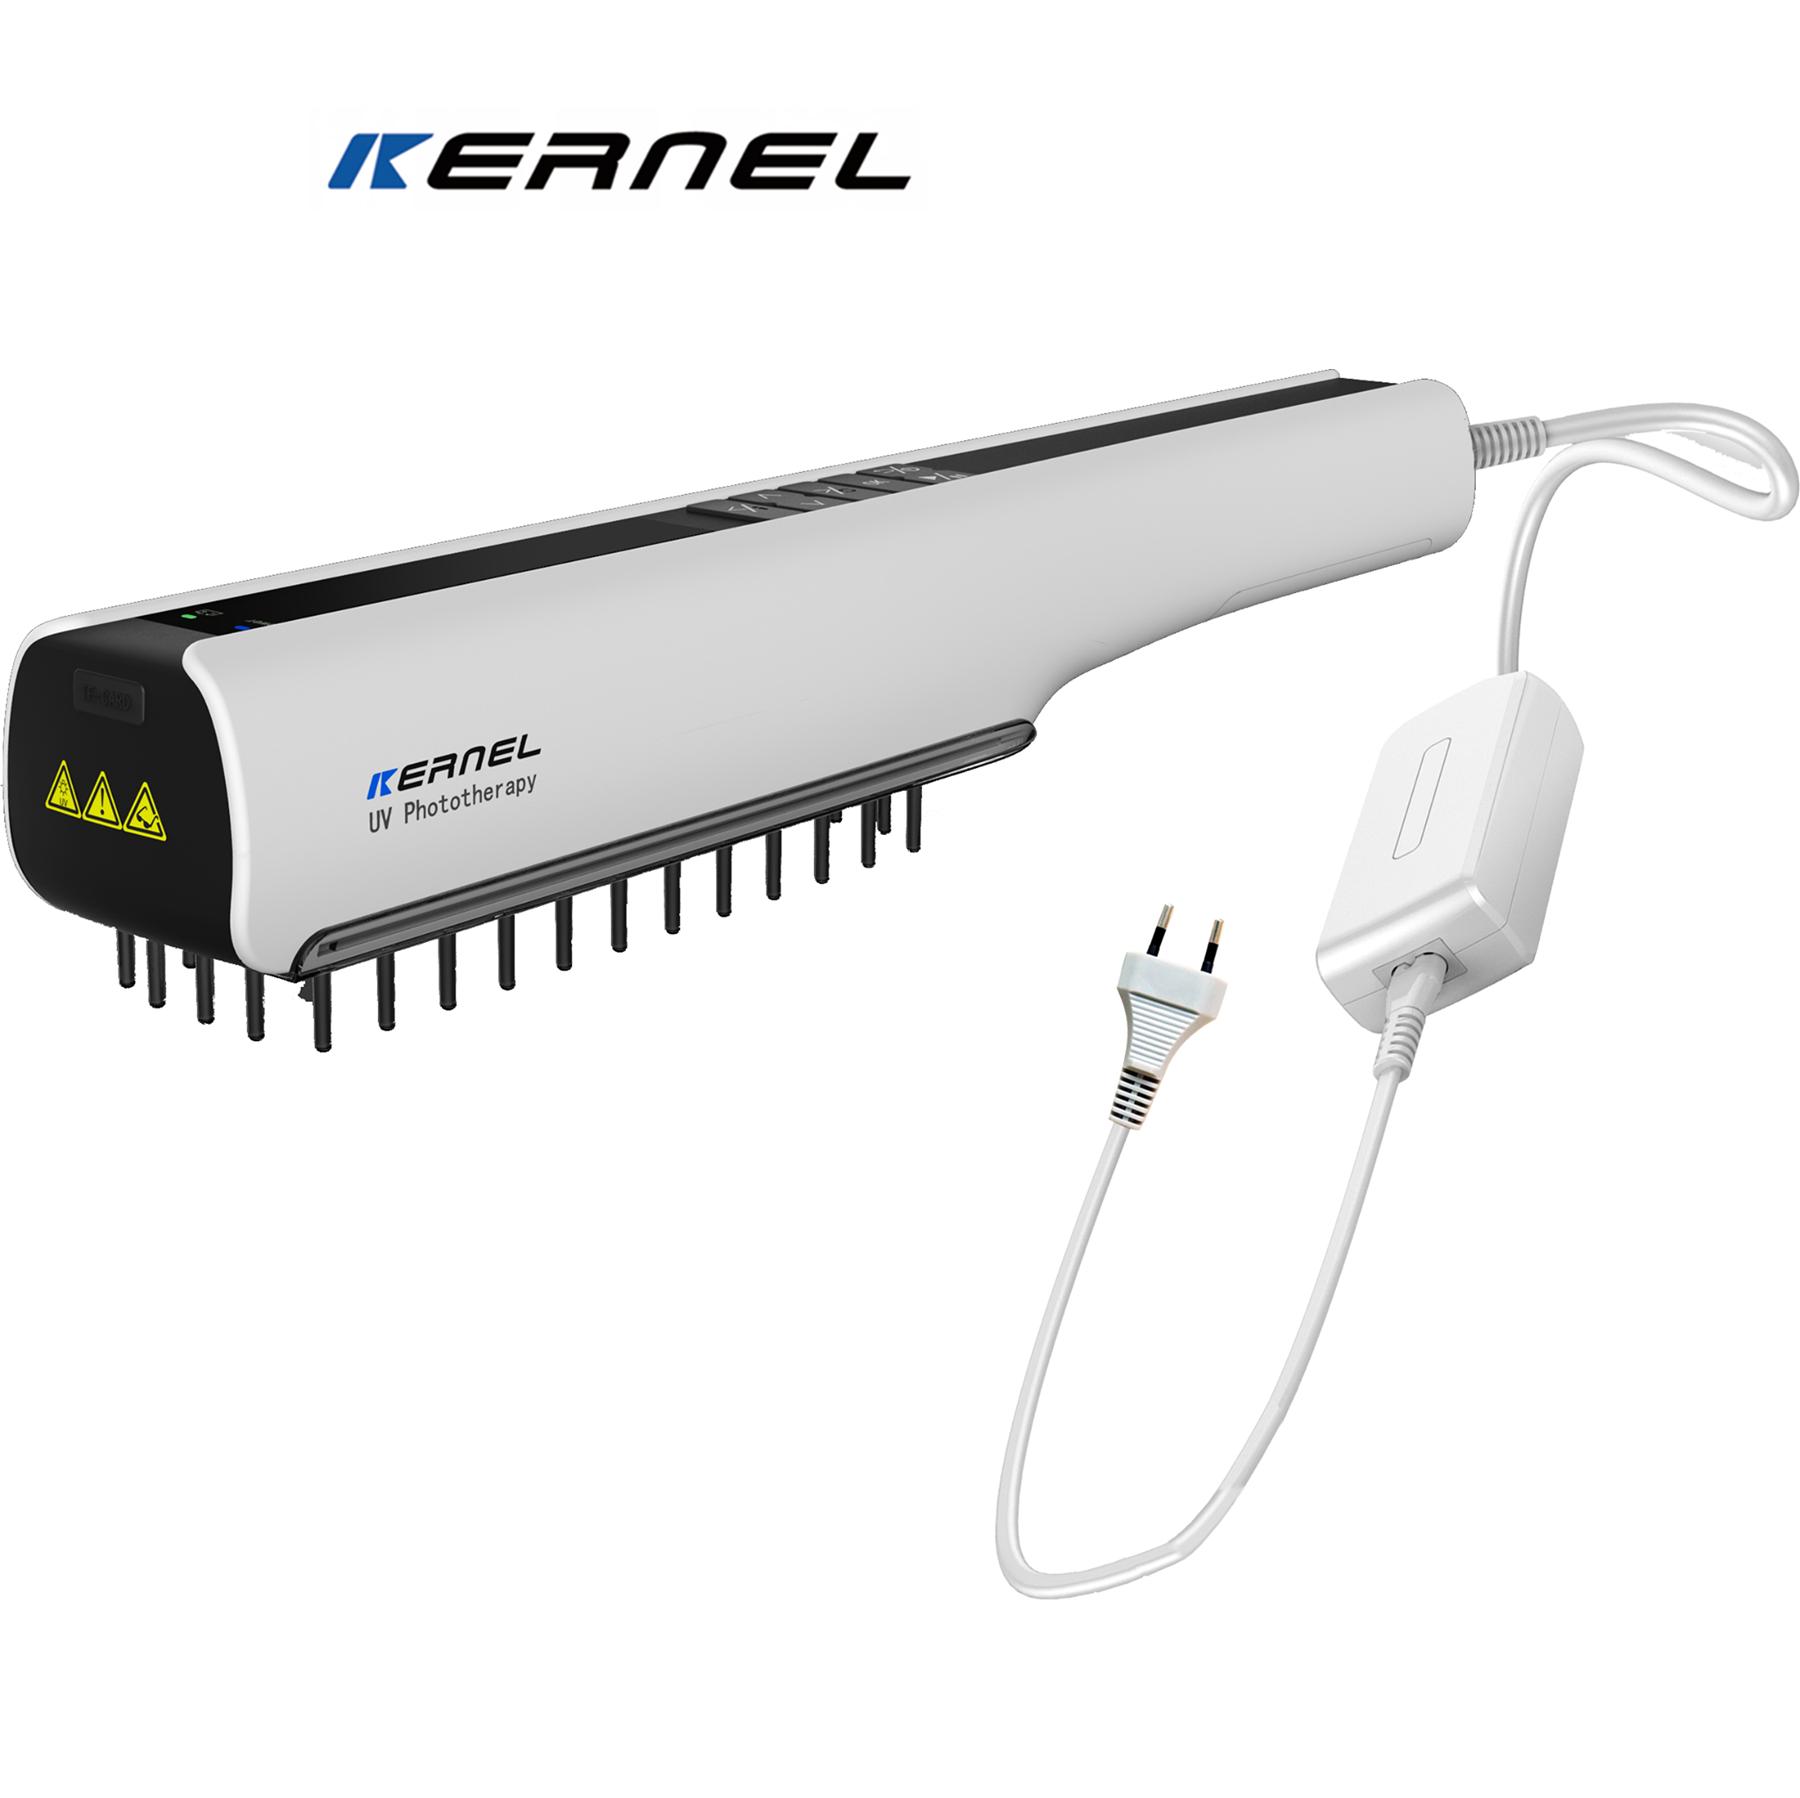 311nm Narrowband UVB Lamps Vitiligo KN-4003BL2